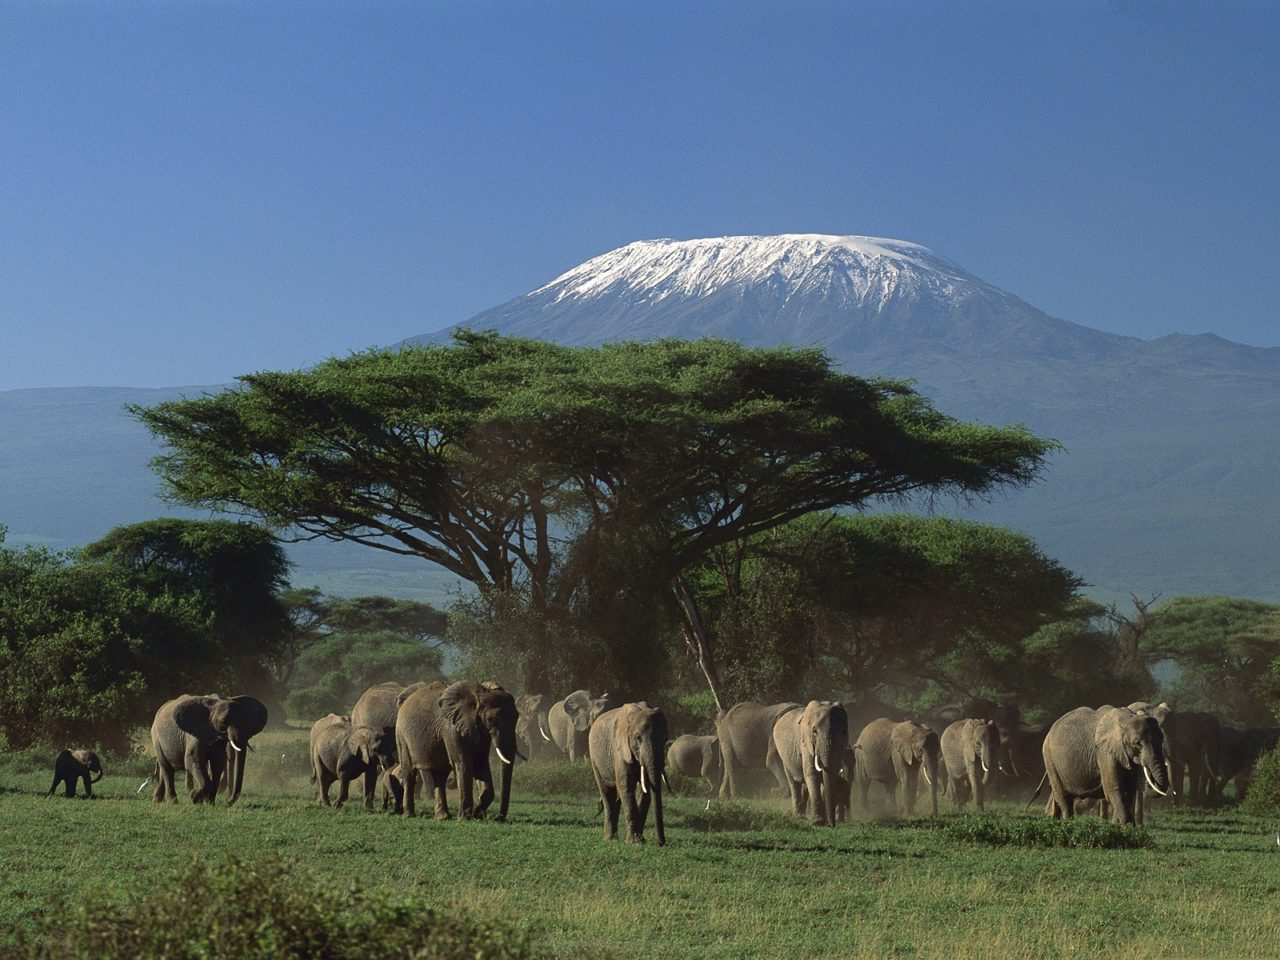 Elephants in the Kenyan savanna